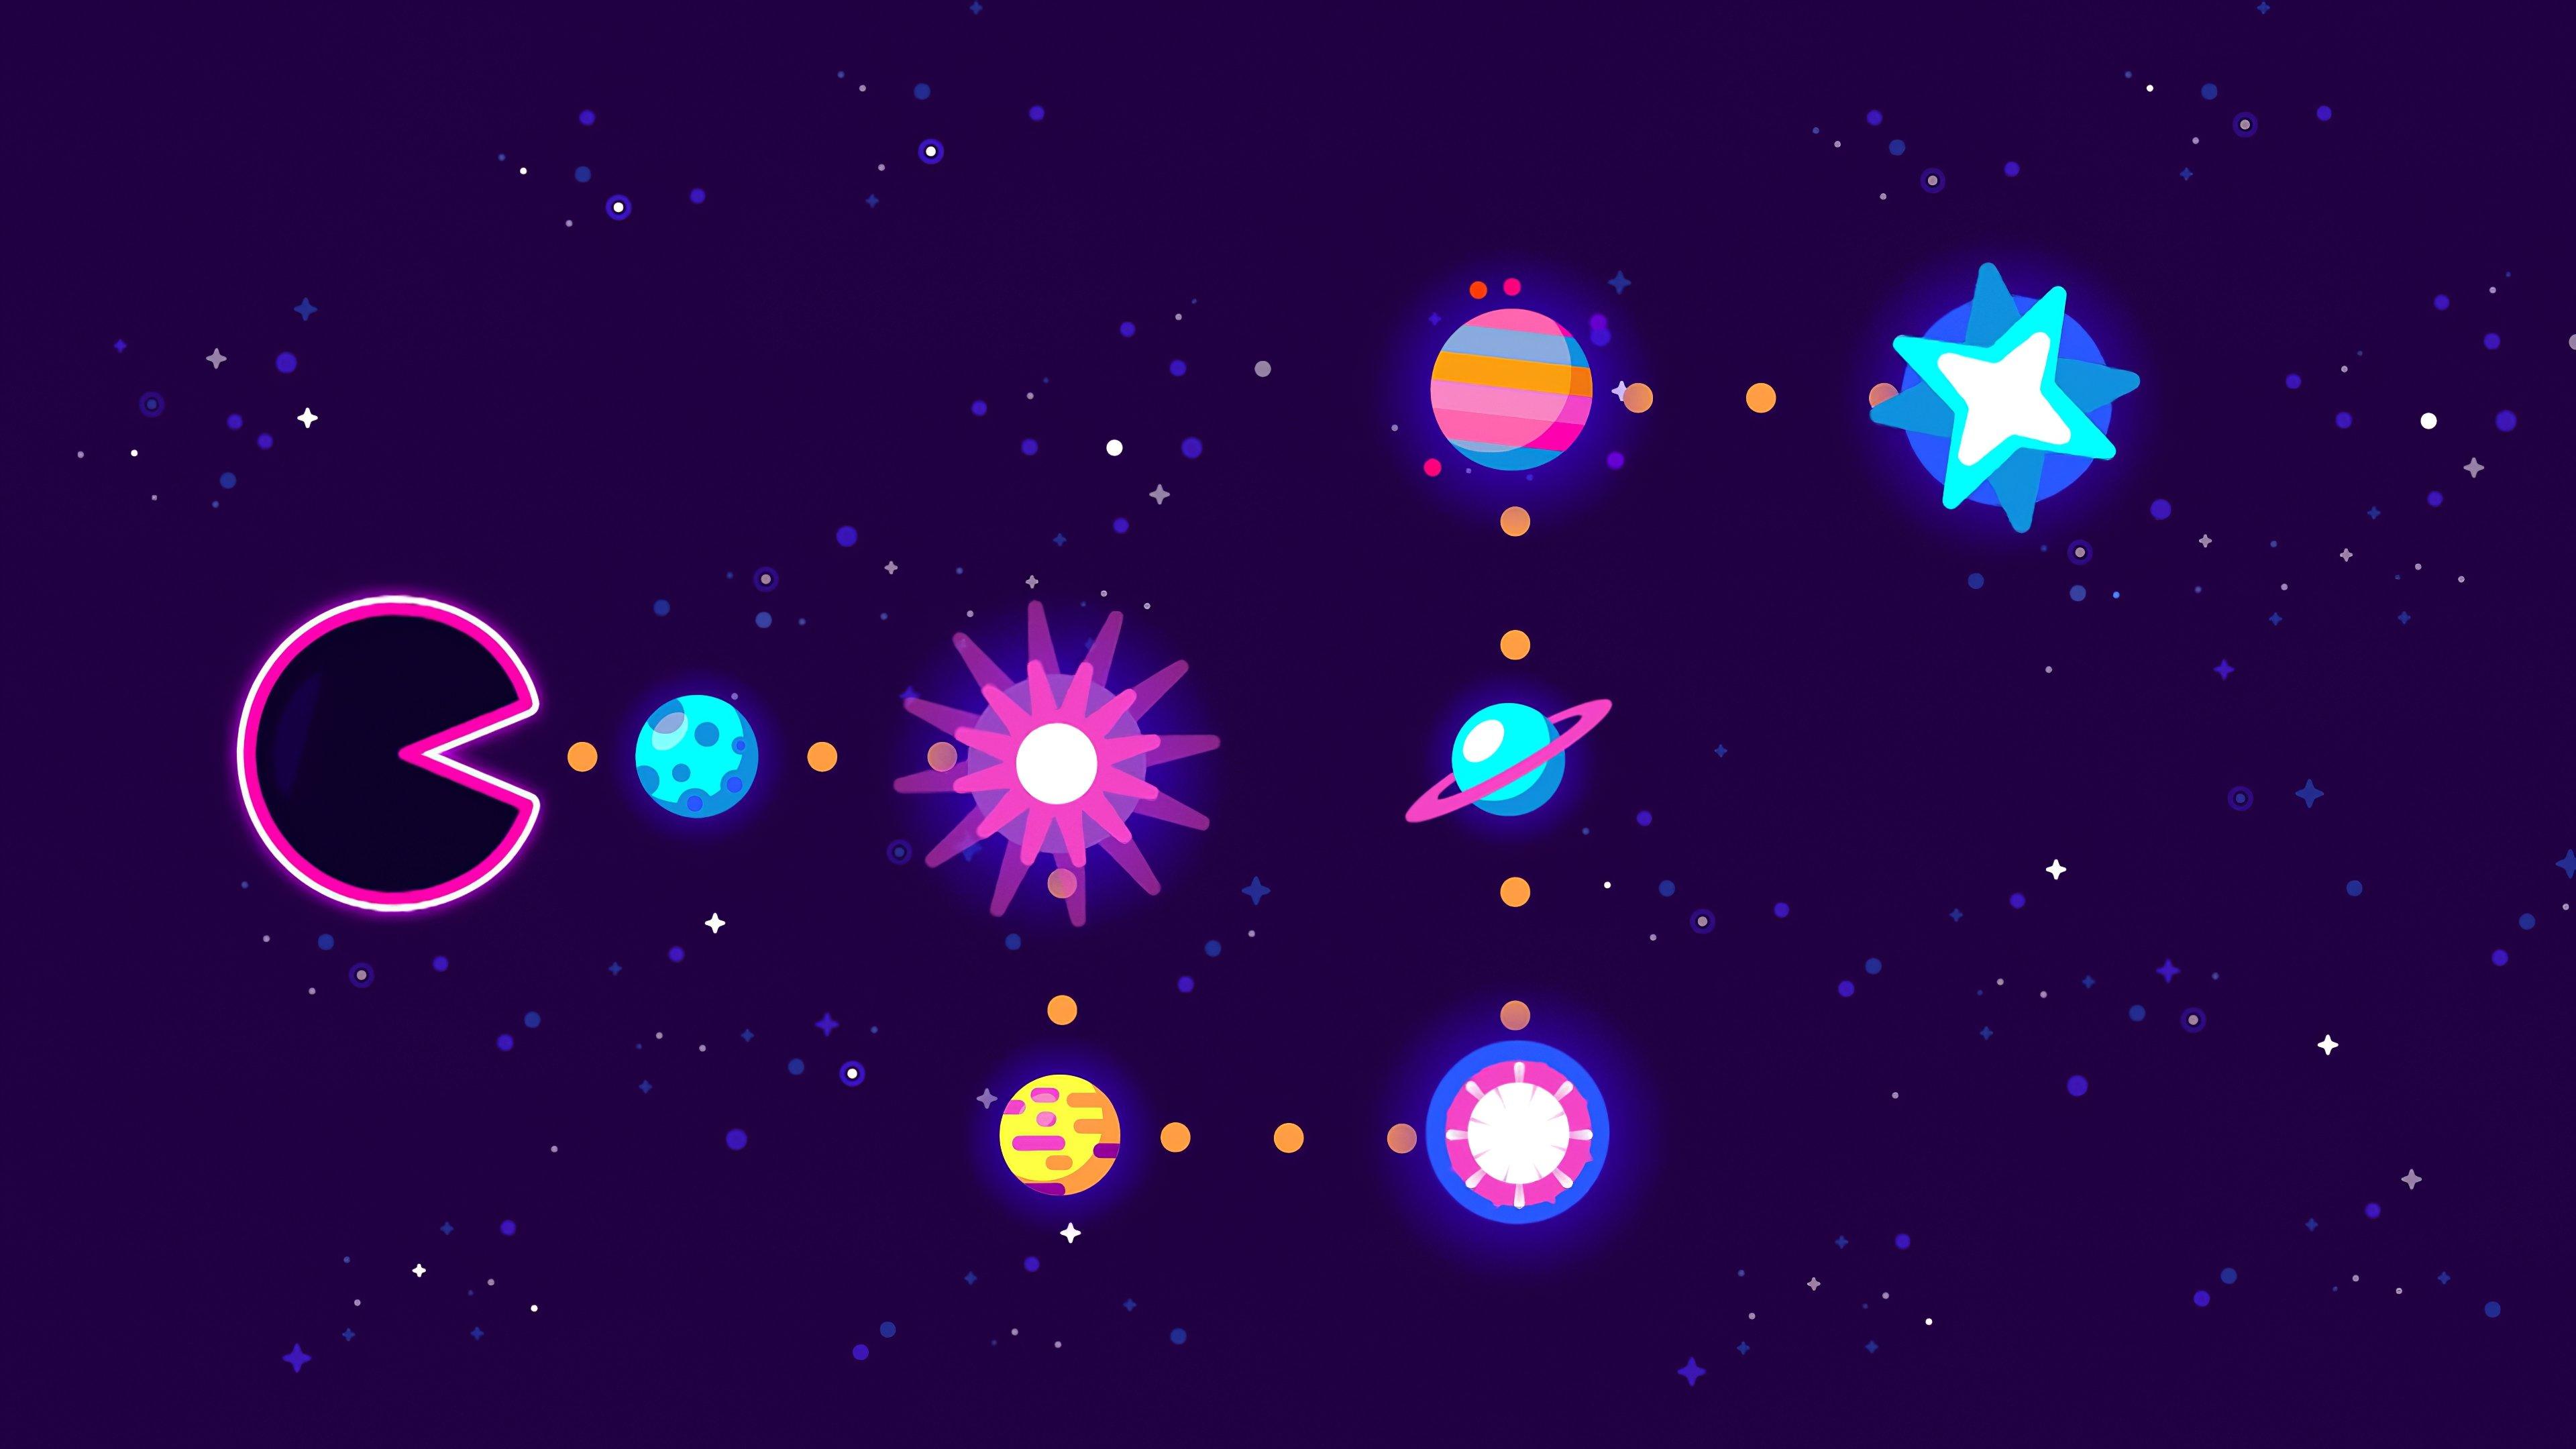 Pacman Eating Planets Wallpaper 4k Ultra Hd Id 5169